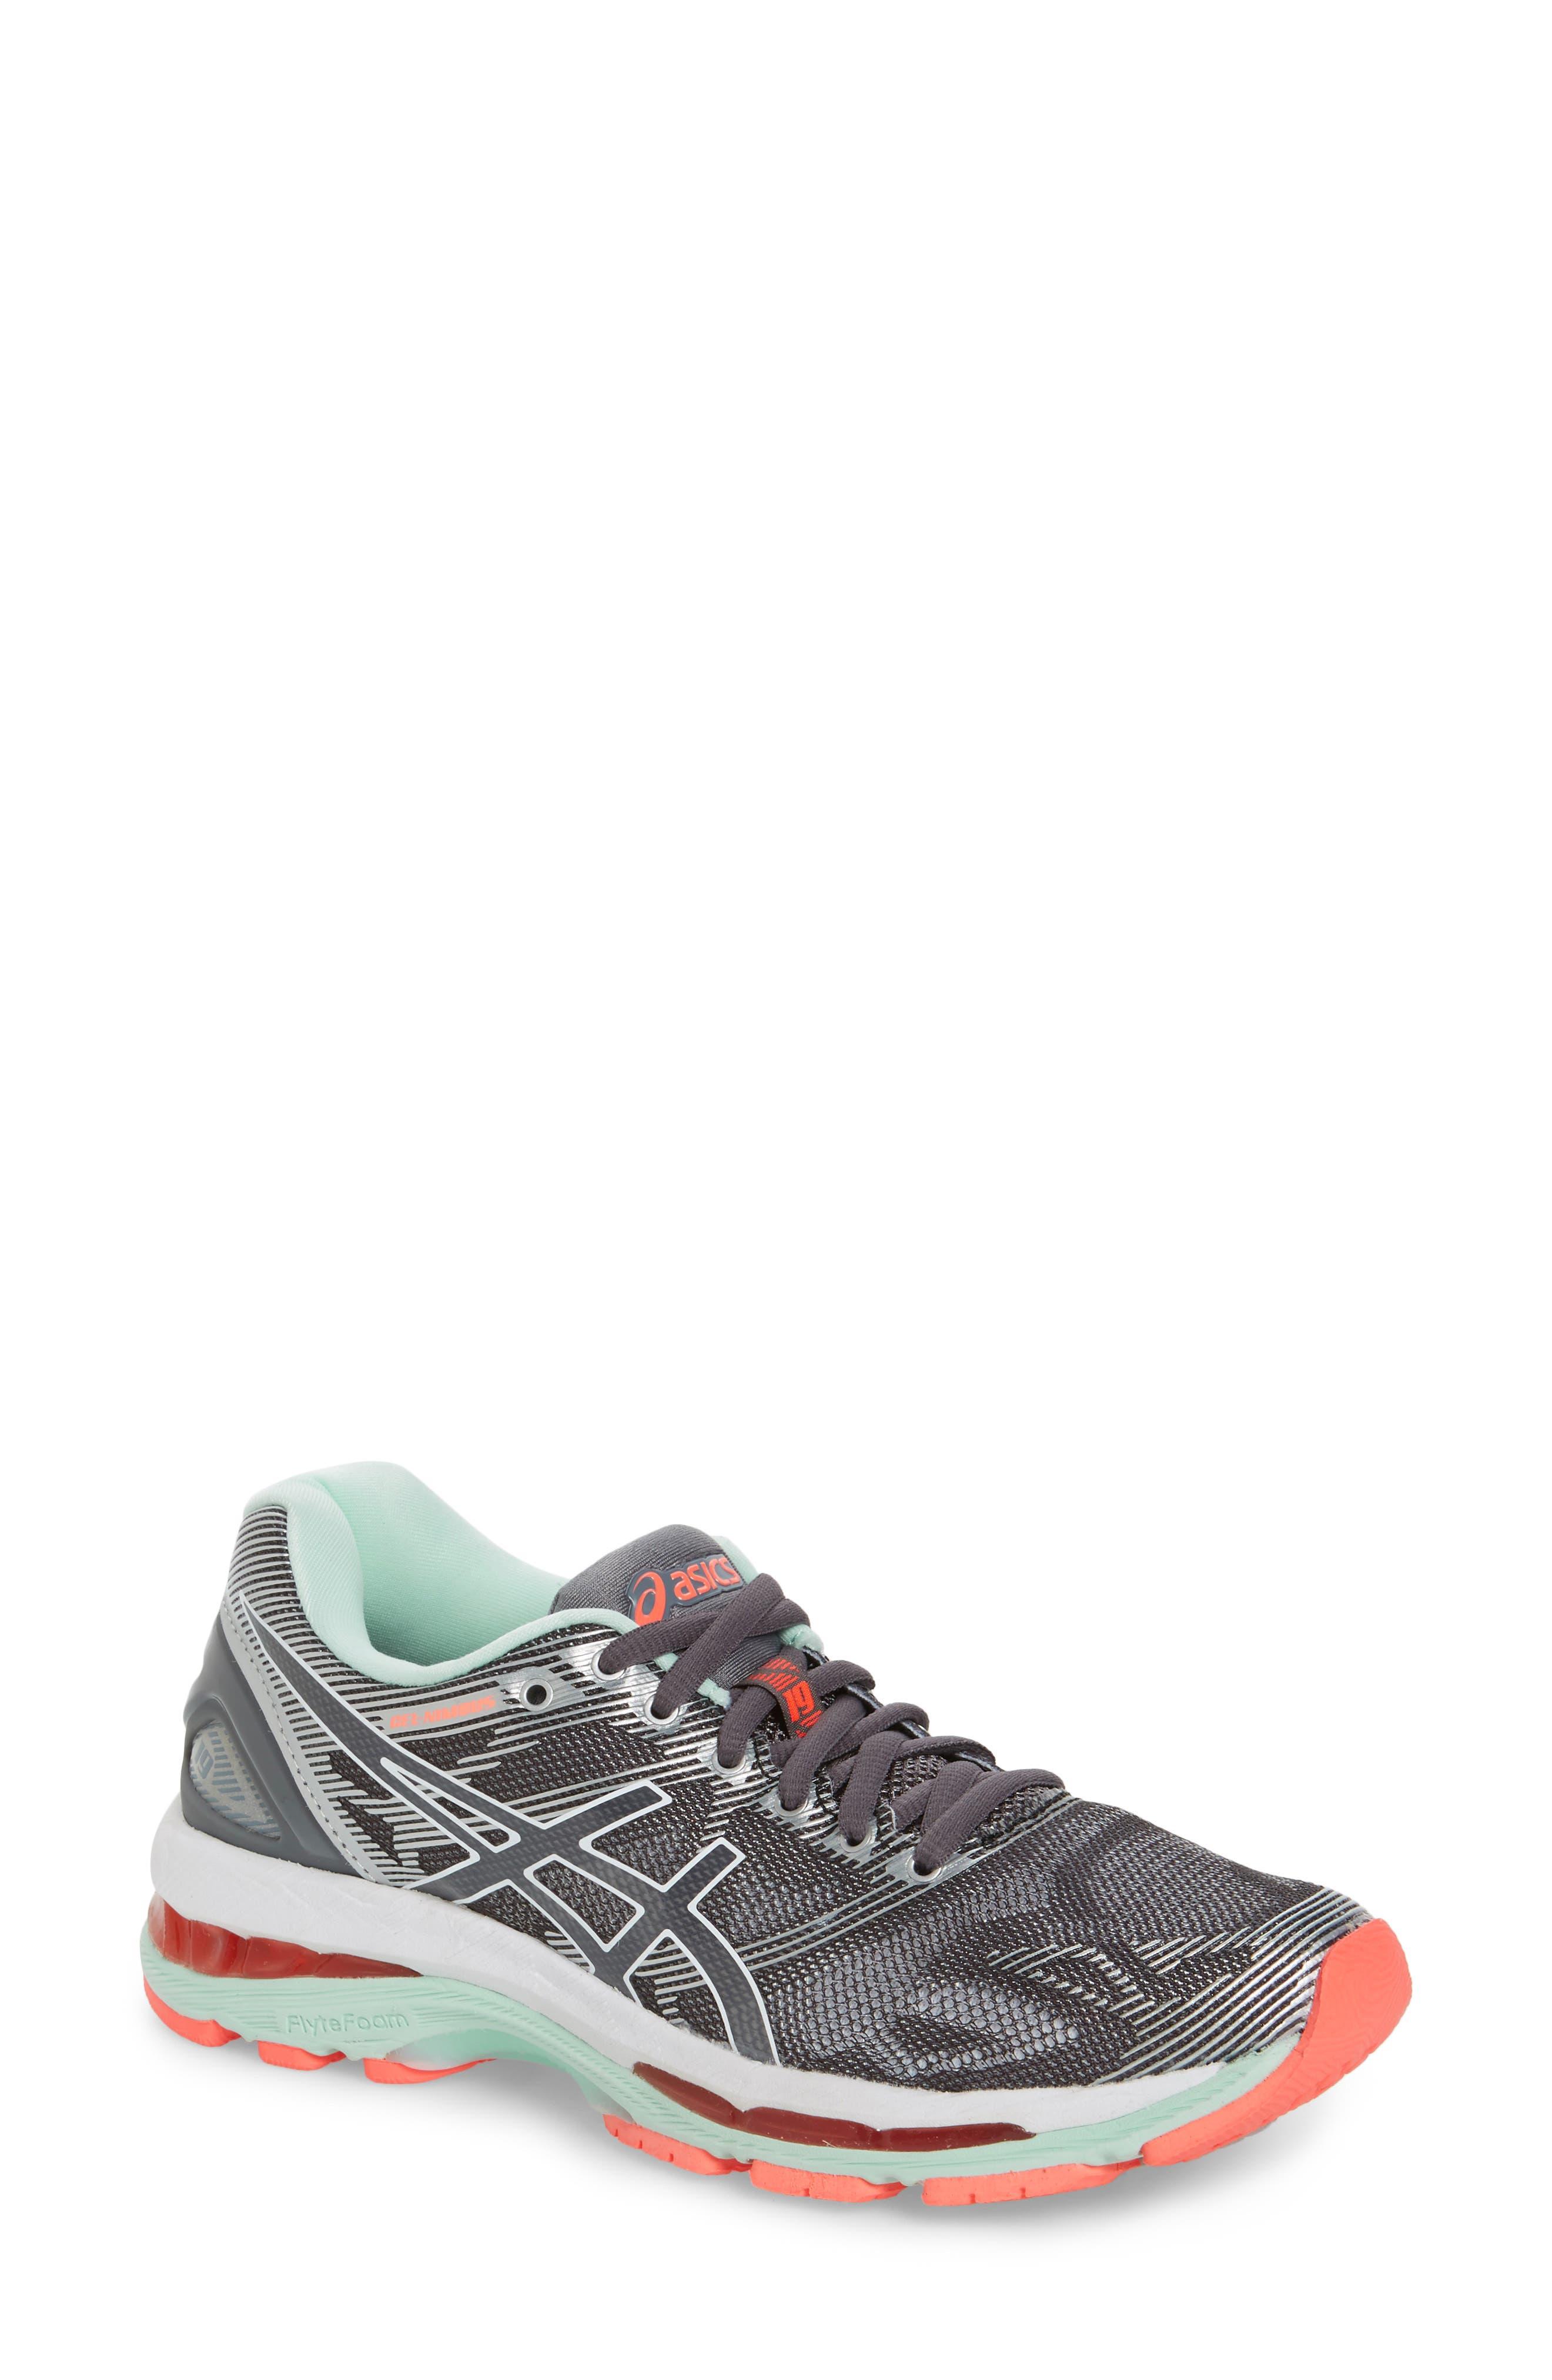 Main Image - ASICS® GEL®-Nimbus 19 Running Shoe (Women)